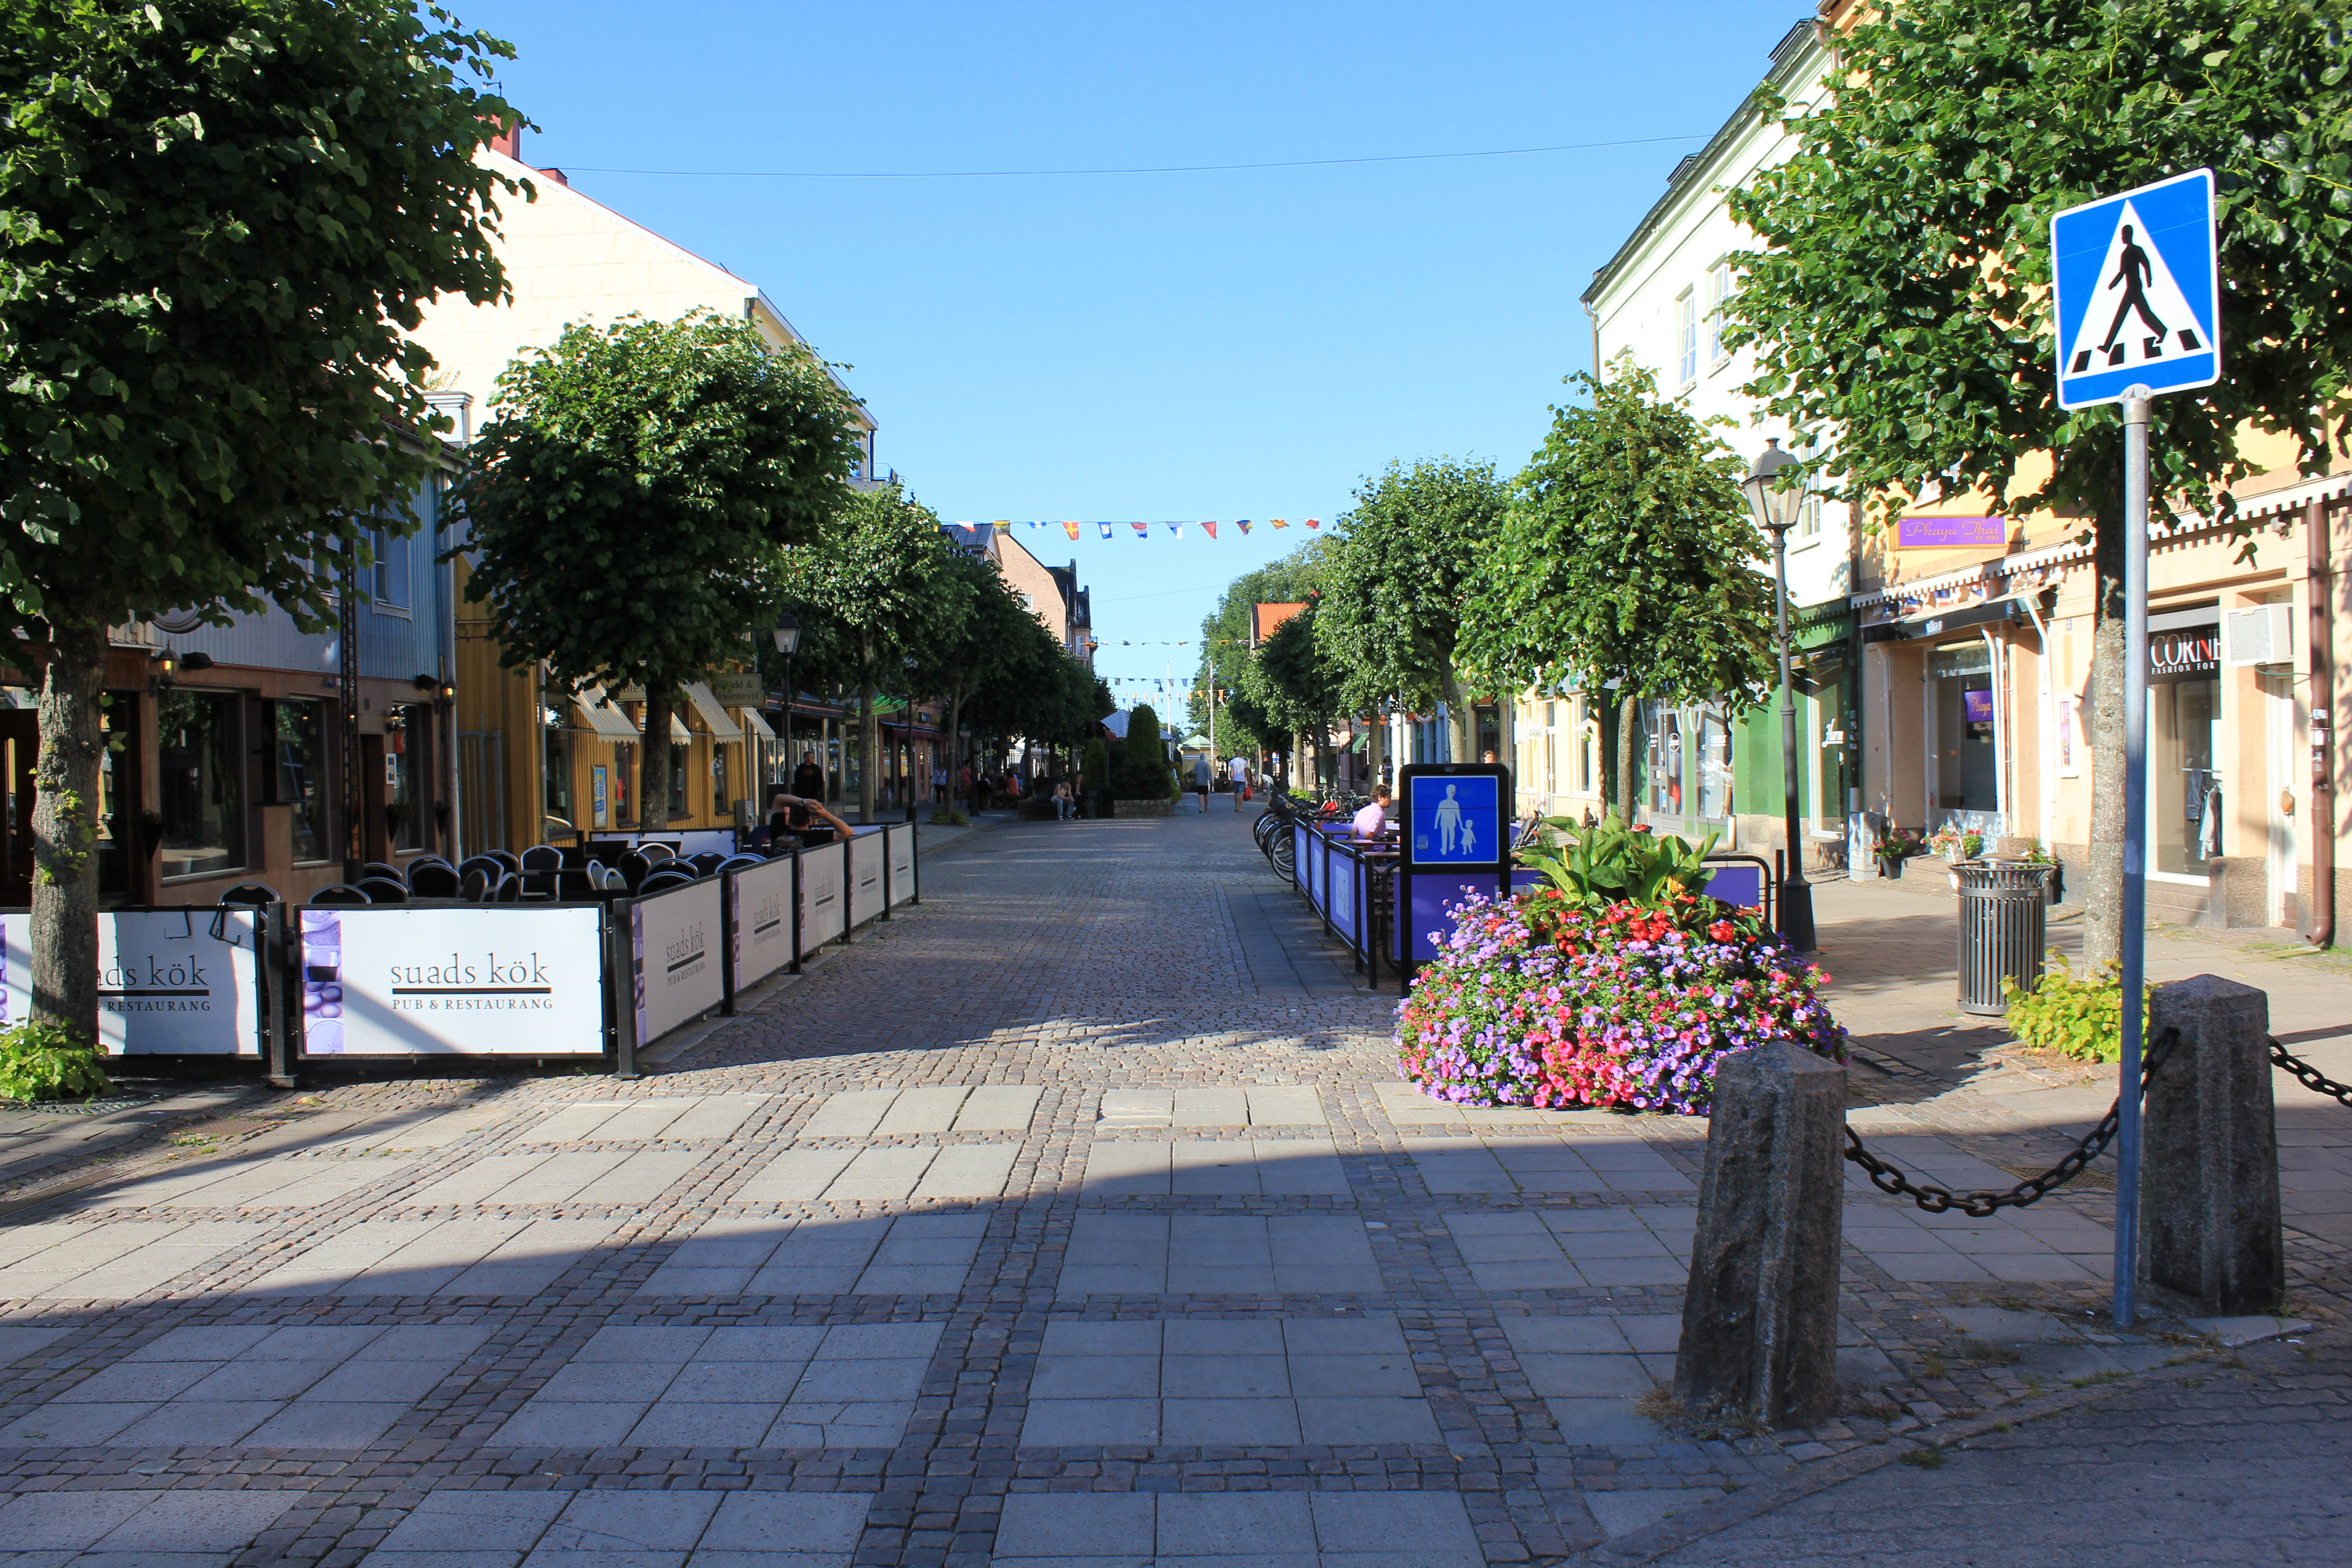 norra kyrketorp dating apps dating sweden nykil